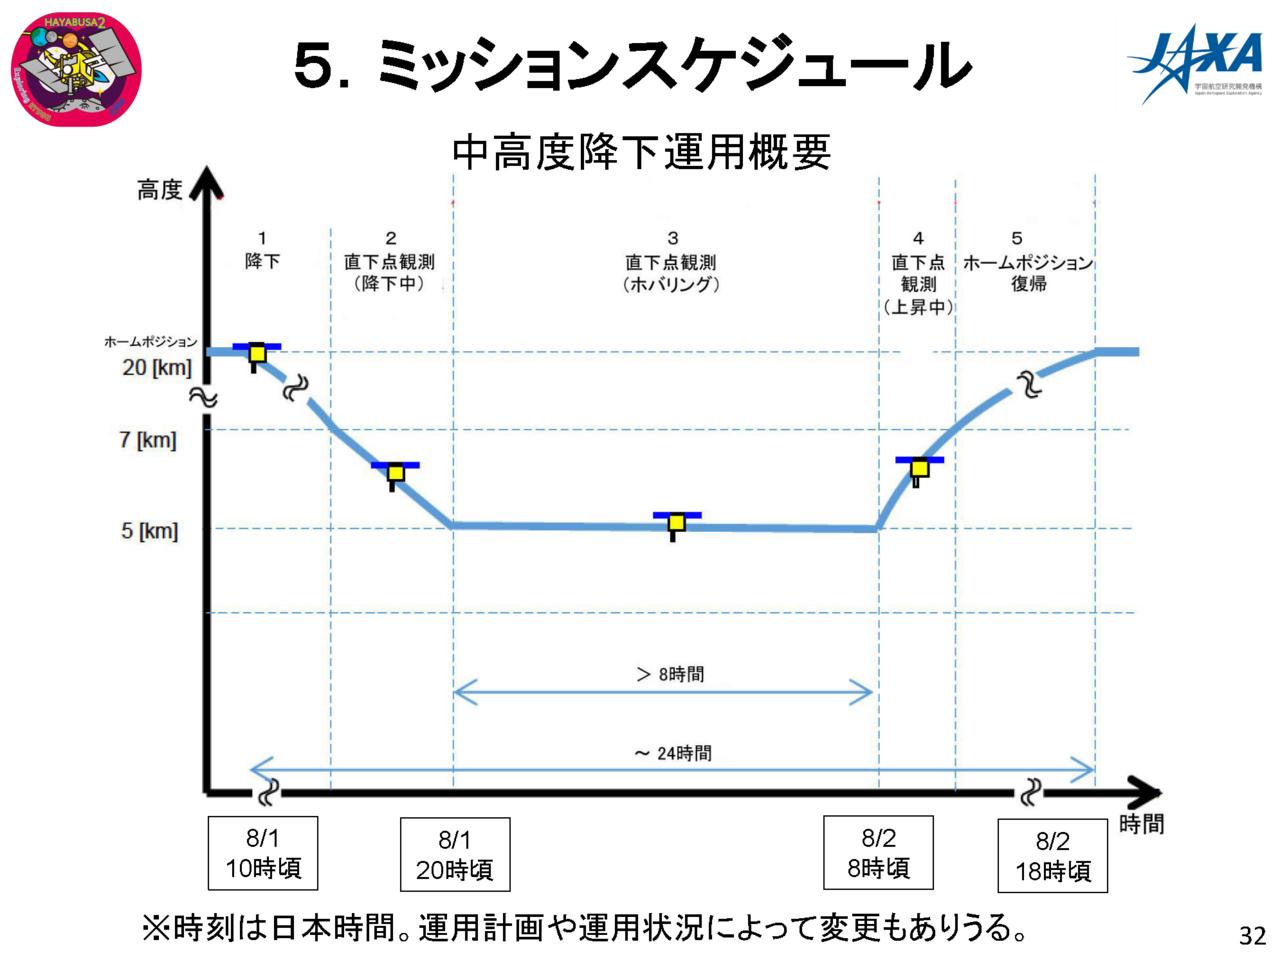 f:id:Imamura:20180719131727p:plain